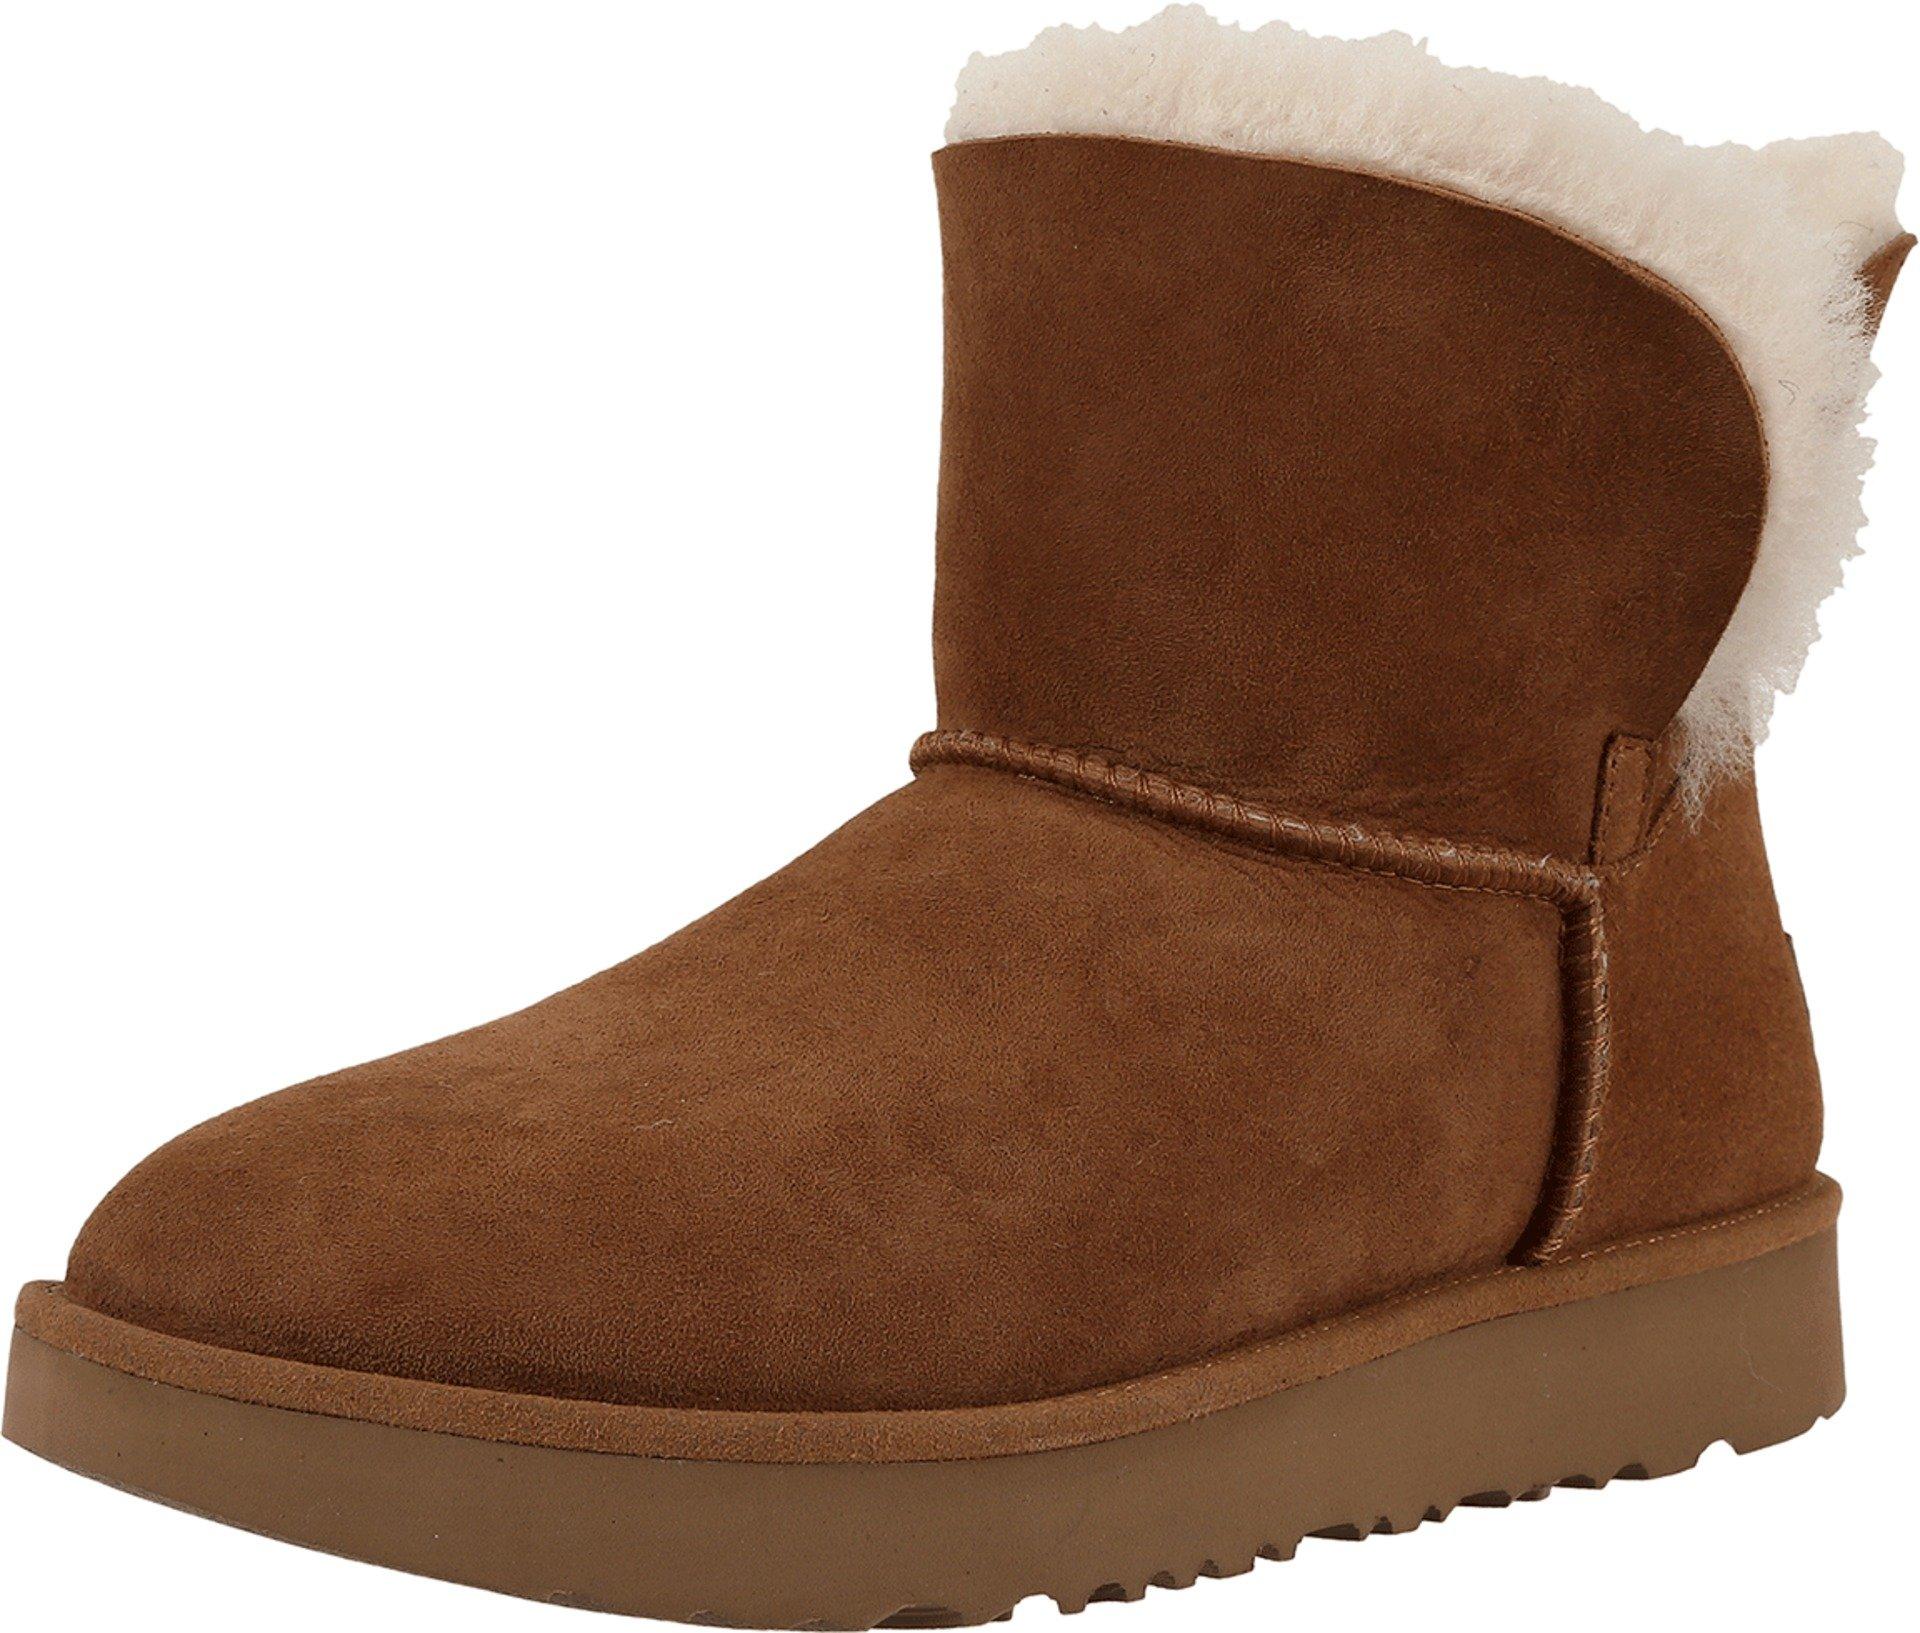 UGG Women's Classic Cuff Mini Winter Boot, Chestnut, 7.5 M US